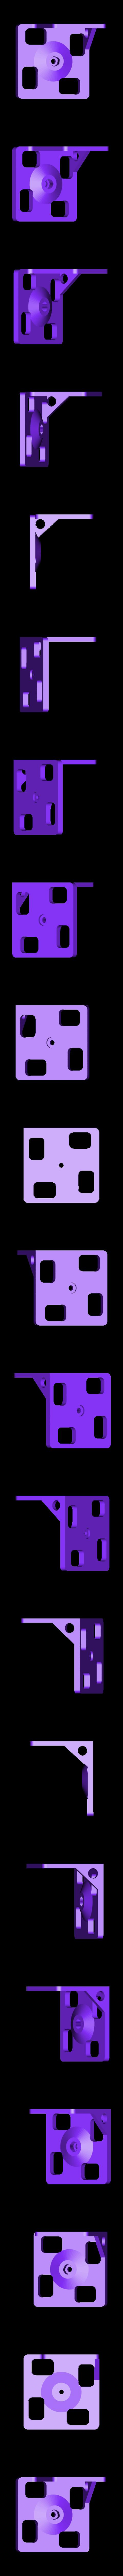 roll05.STL Download free STL file Pan, tilt and roll camera pod for FPV. • 3D printing object, tahustvedt